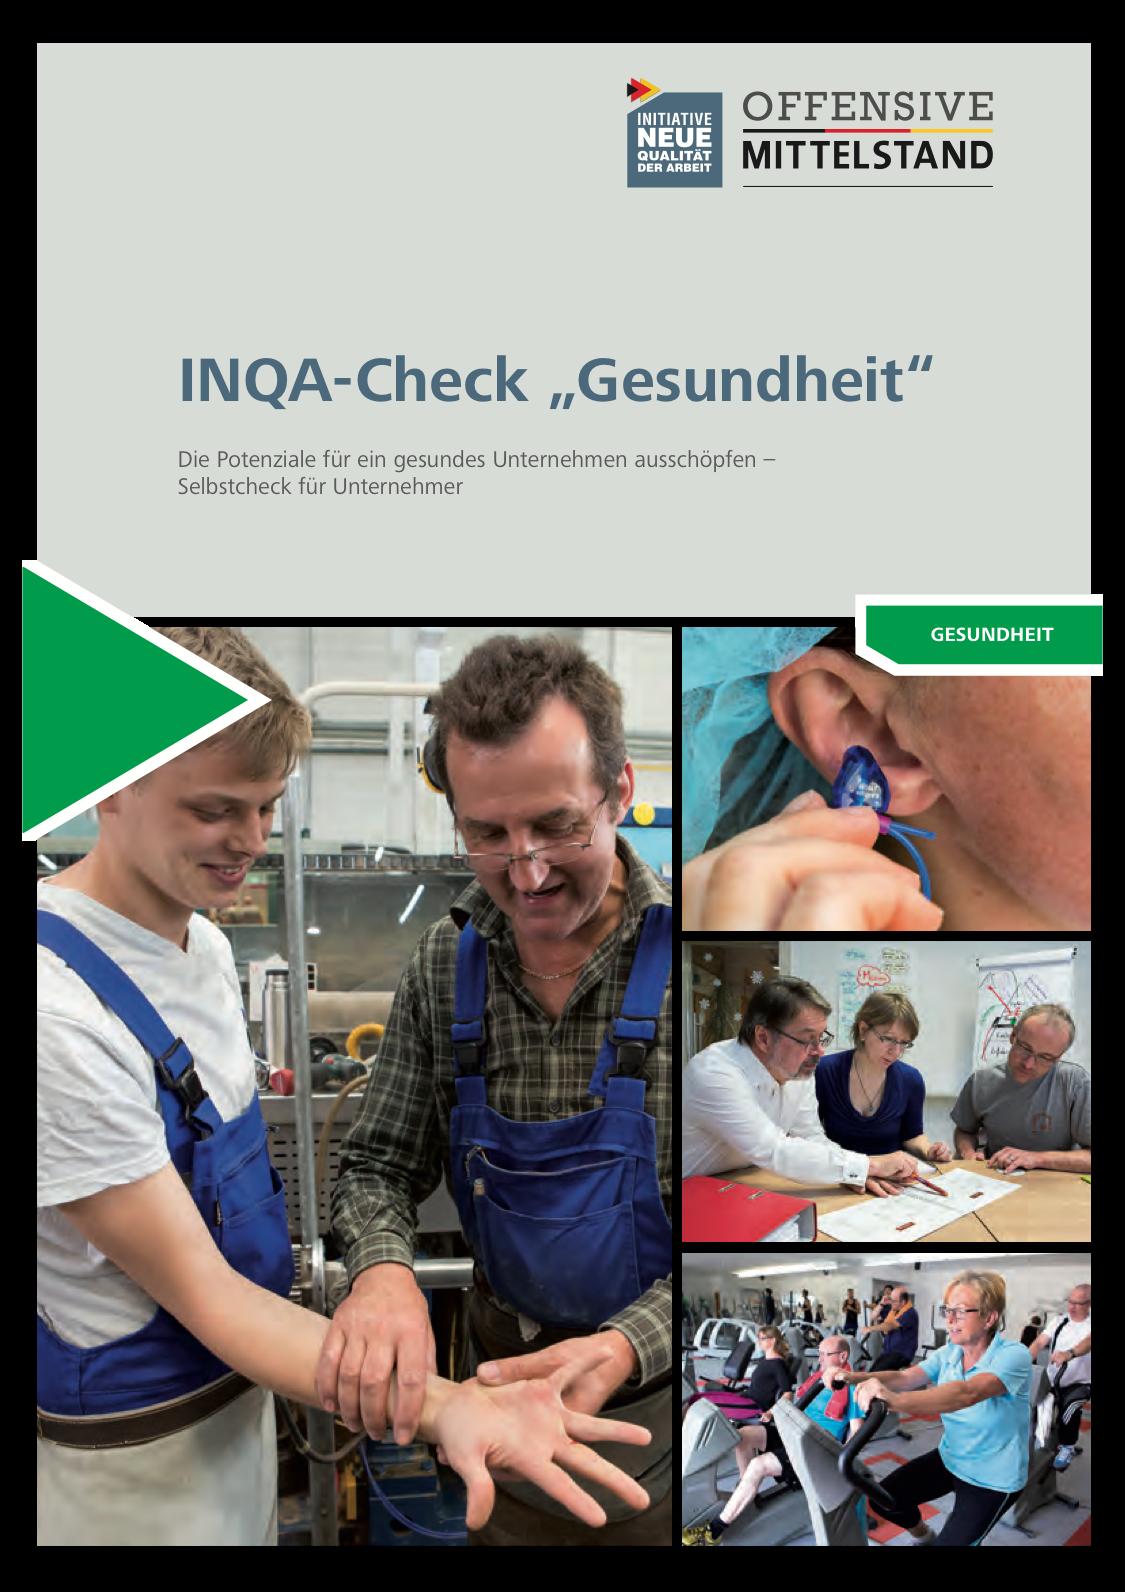 INQA_Check_Gesundheit_db